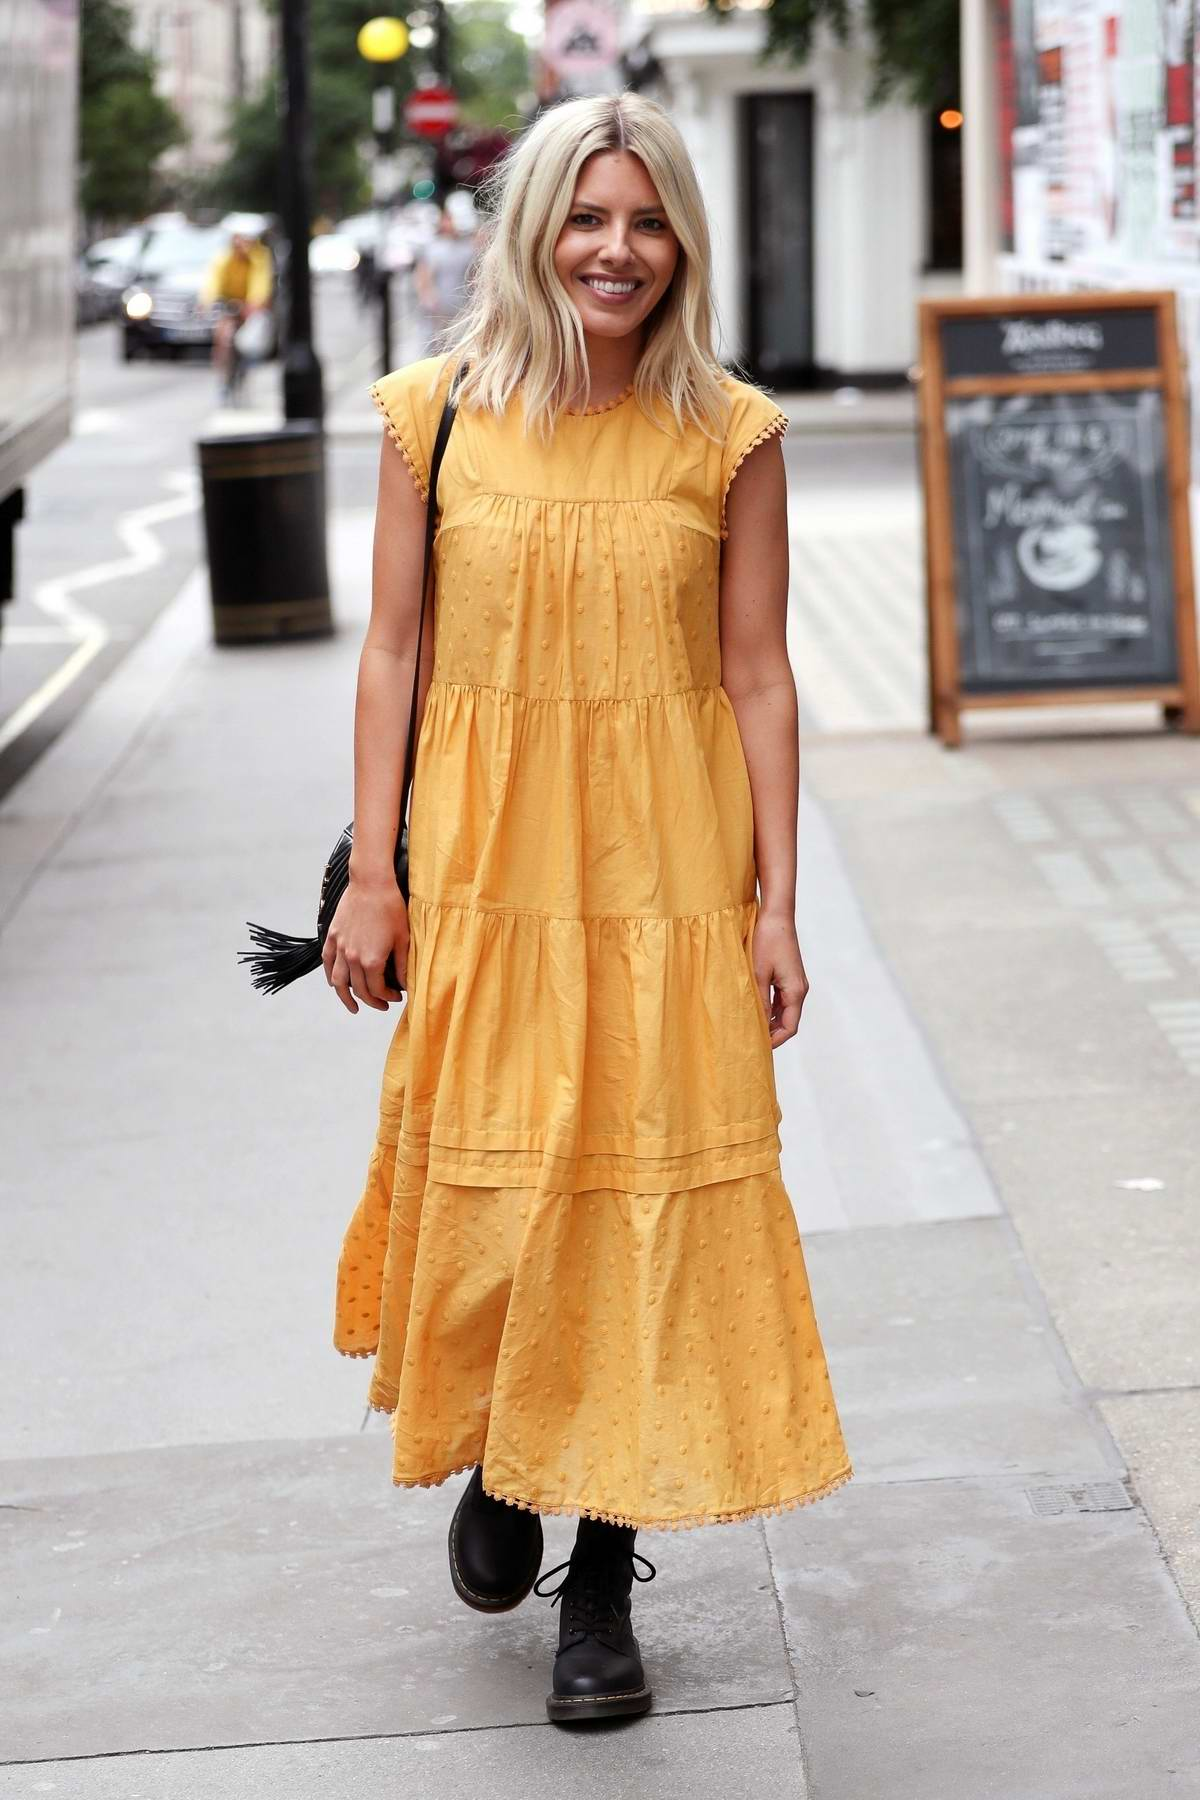 Mollie King seen wearing a yellow summer dress as she exits Juice bar in Soho, London, UK